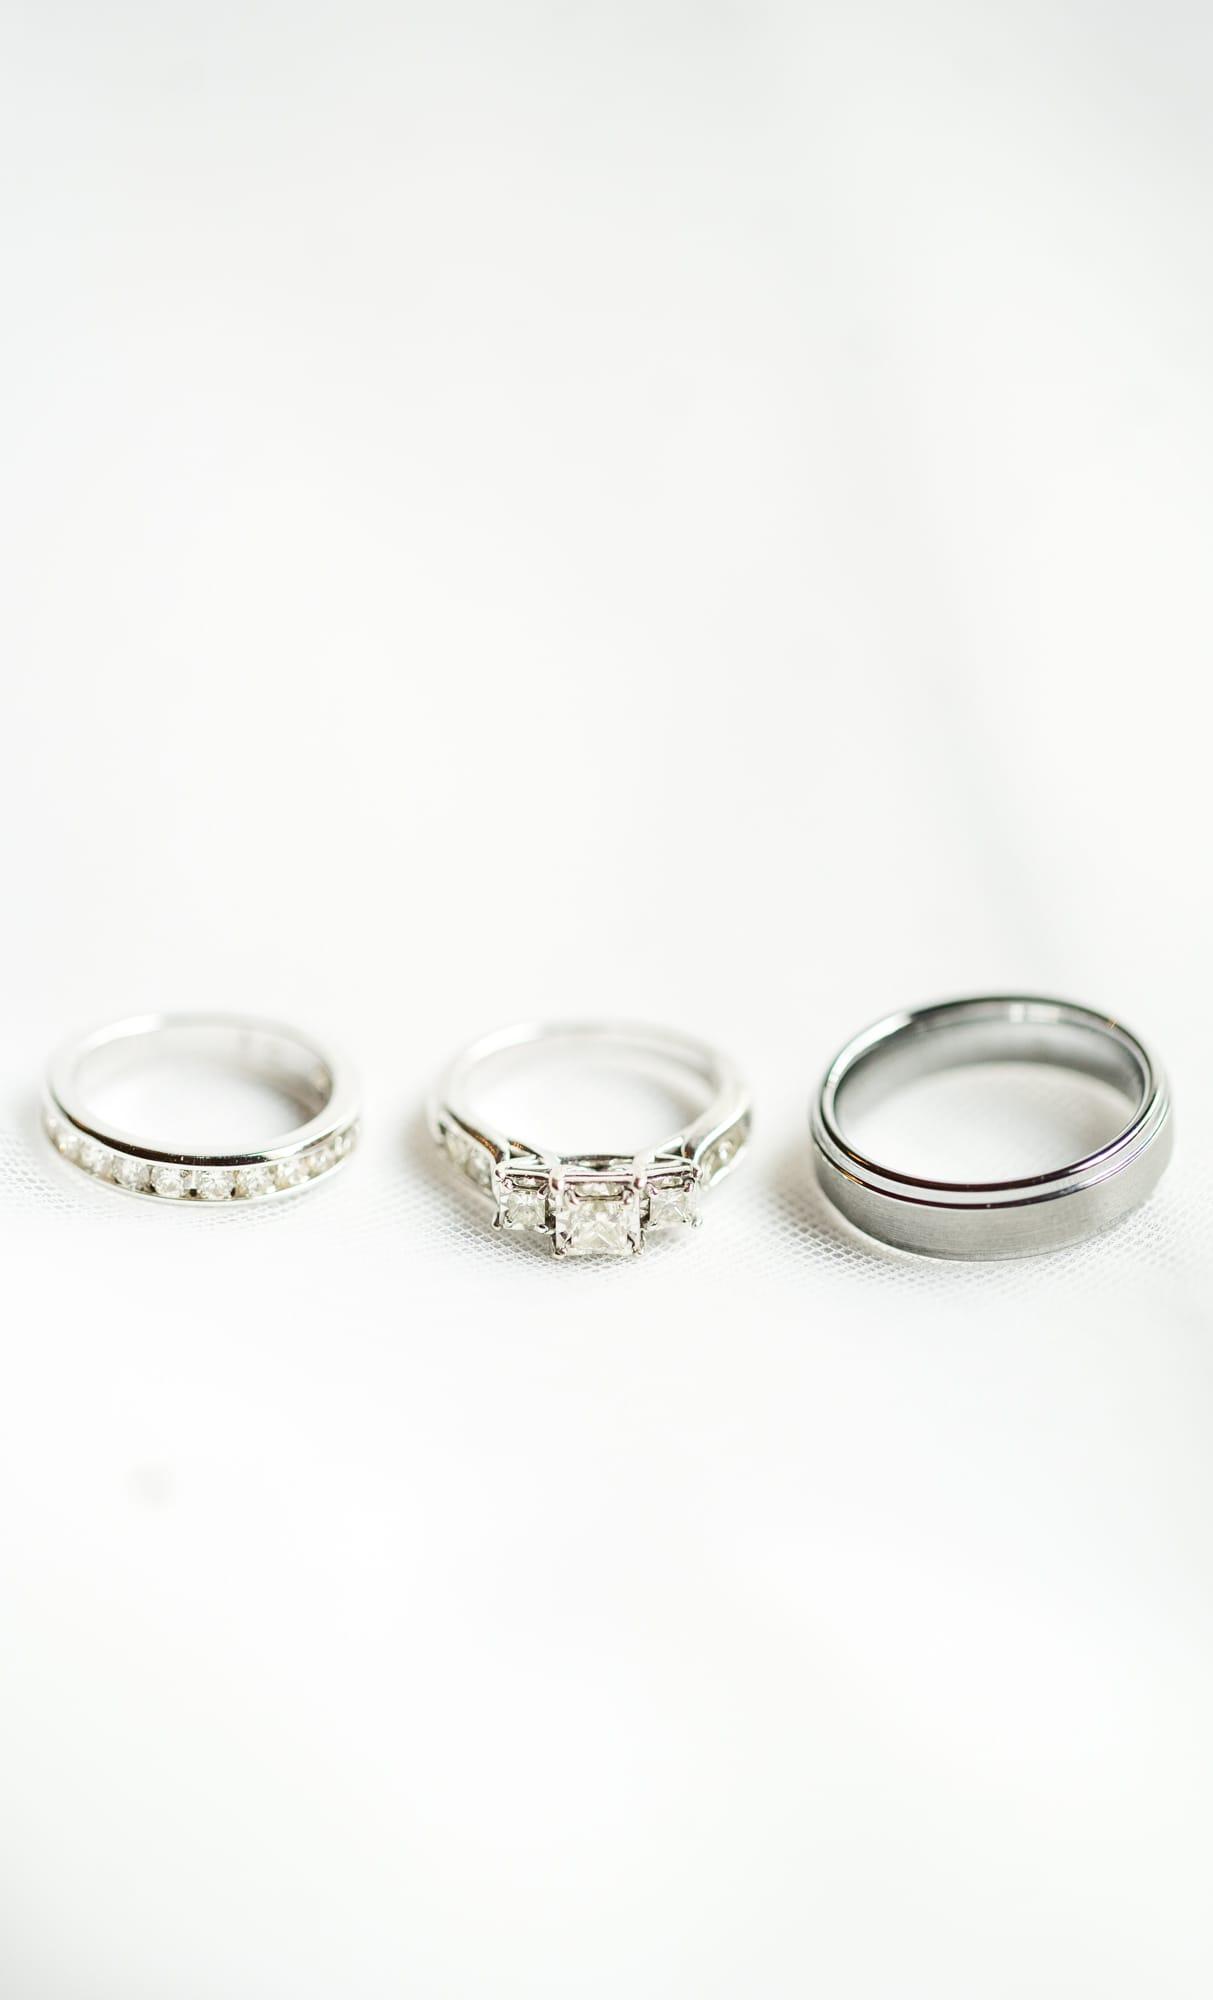 Rings shot at Rolling Rails Lodge wedding